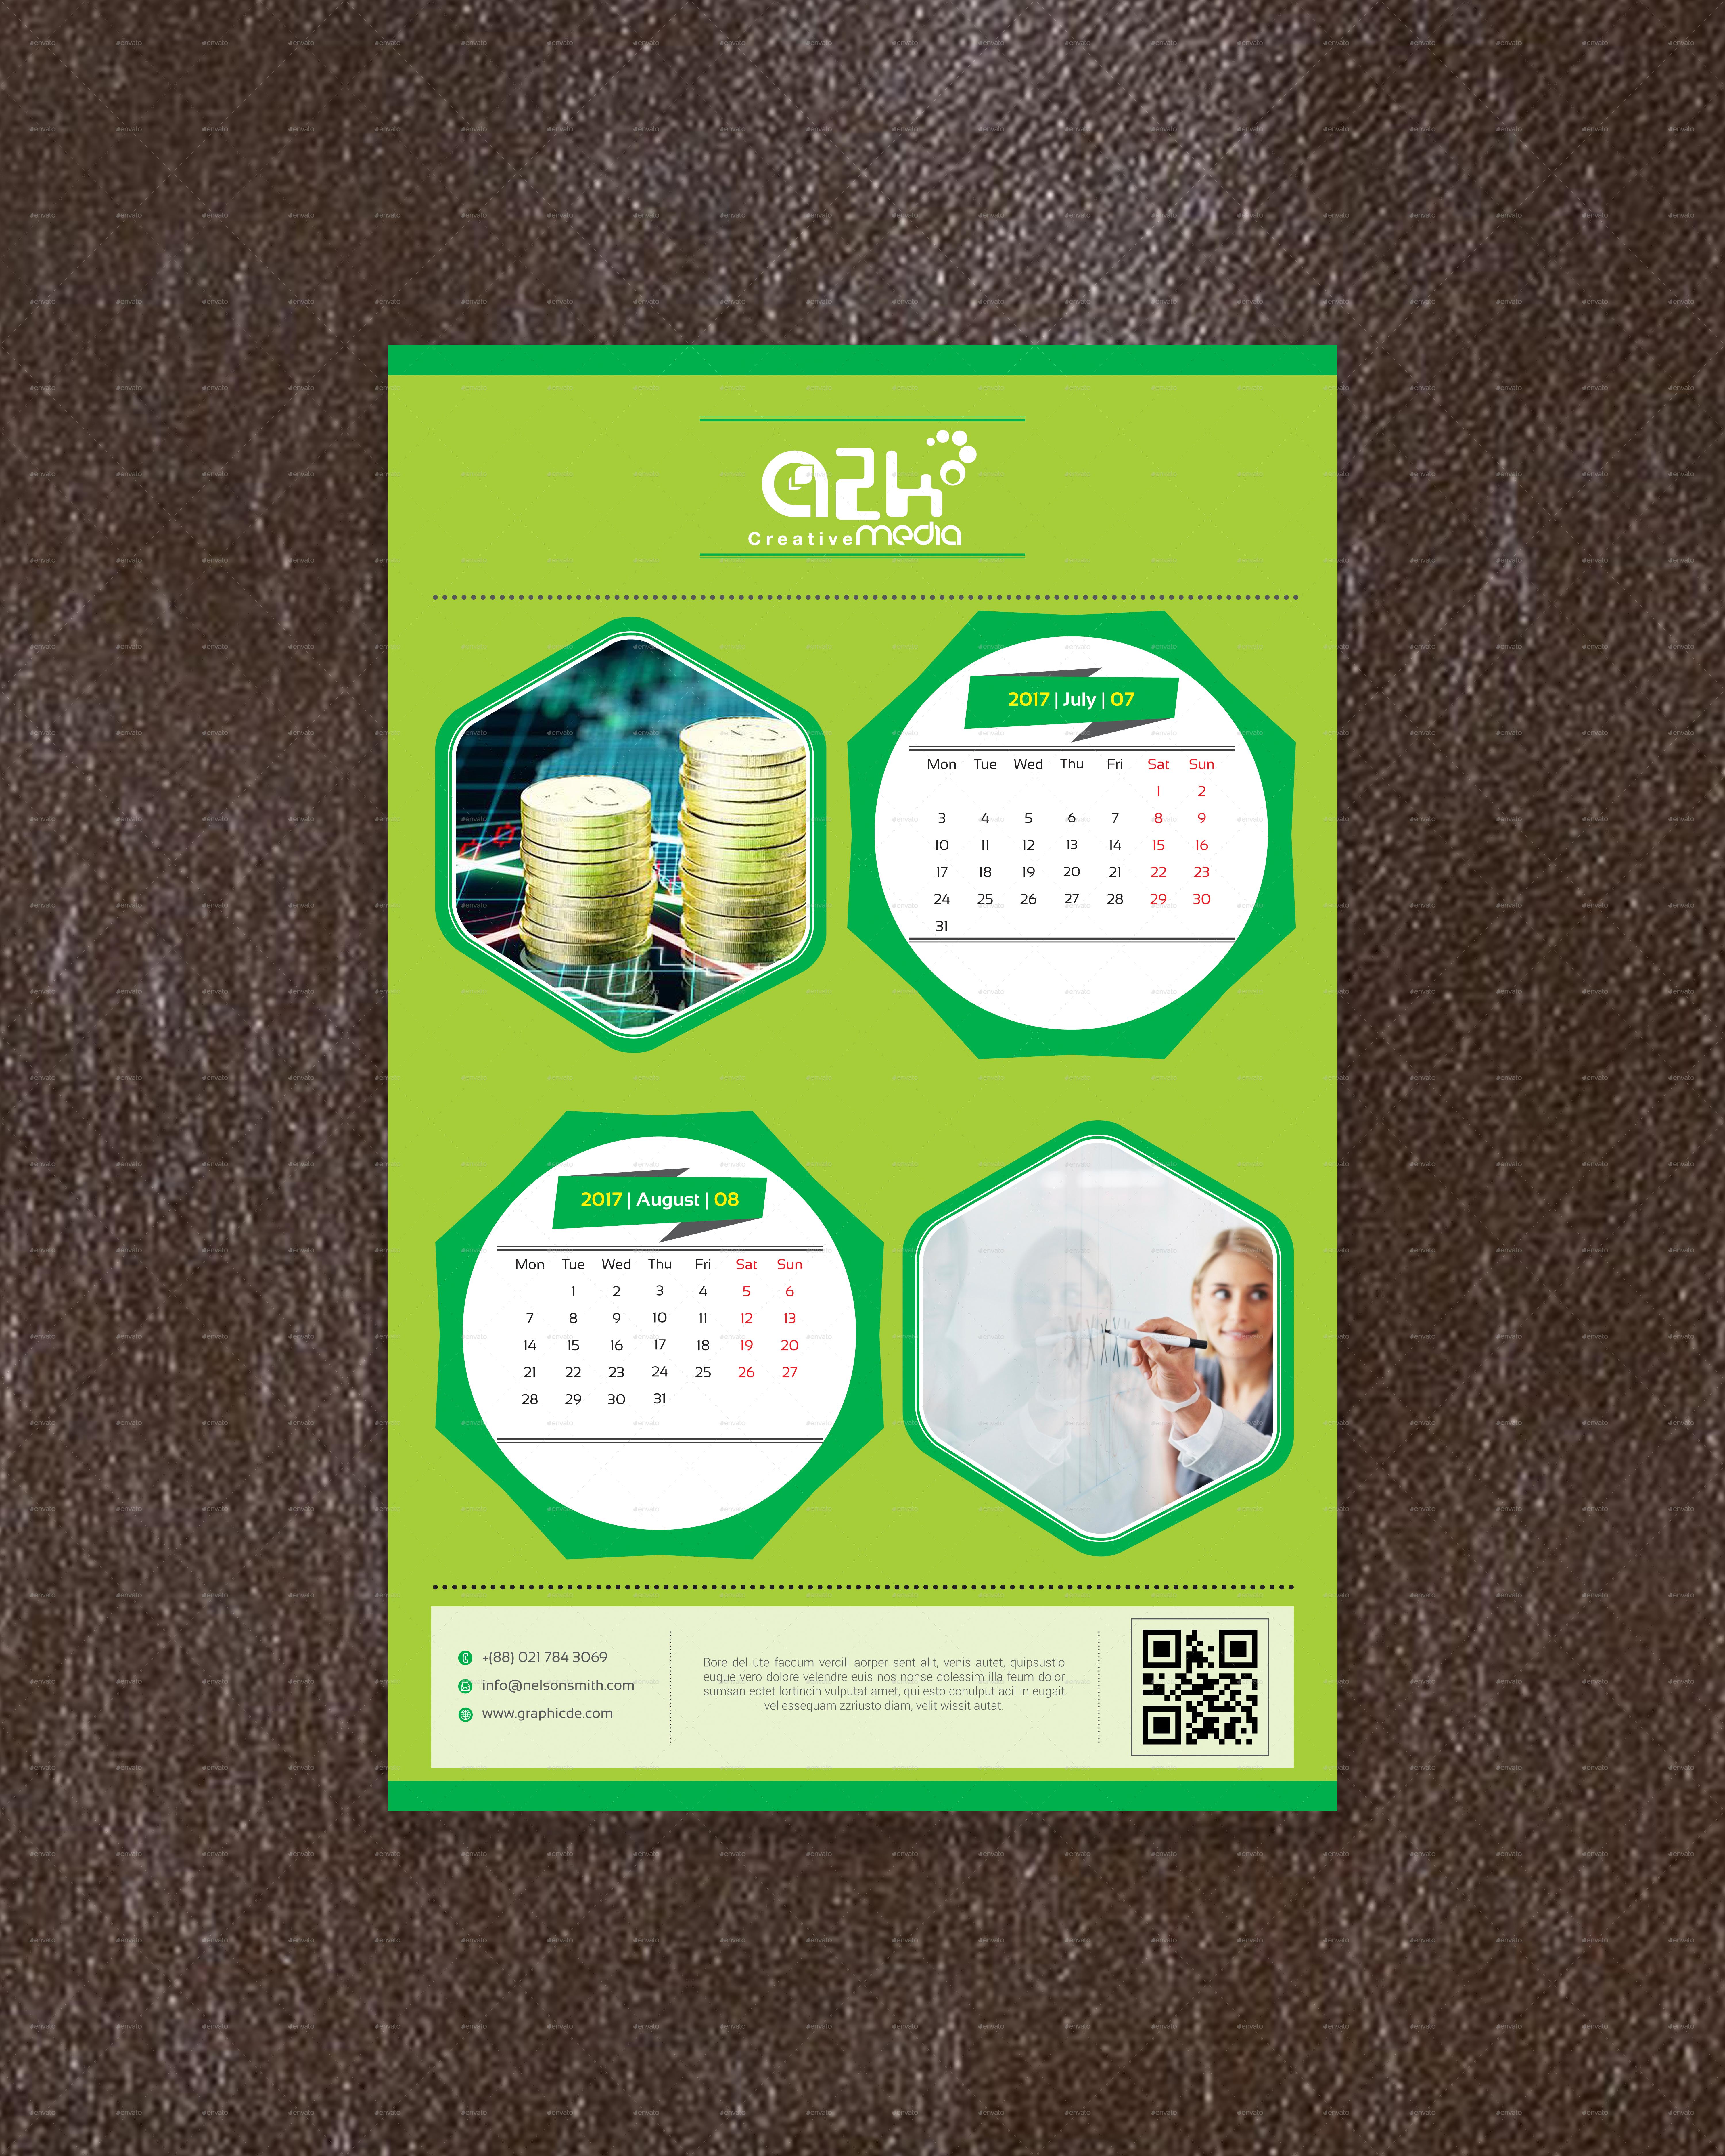 Wall Calendar Design Template V1 by Graphicssolution | GraphicRiver